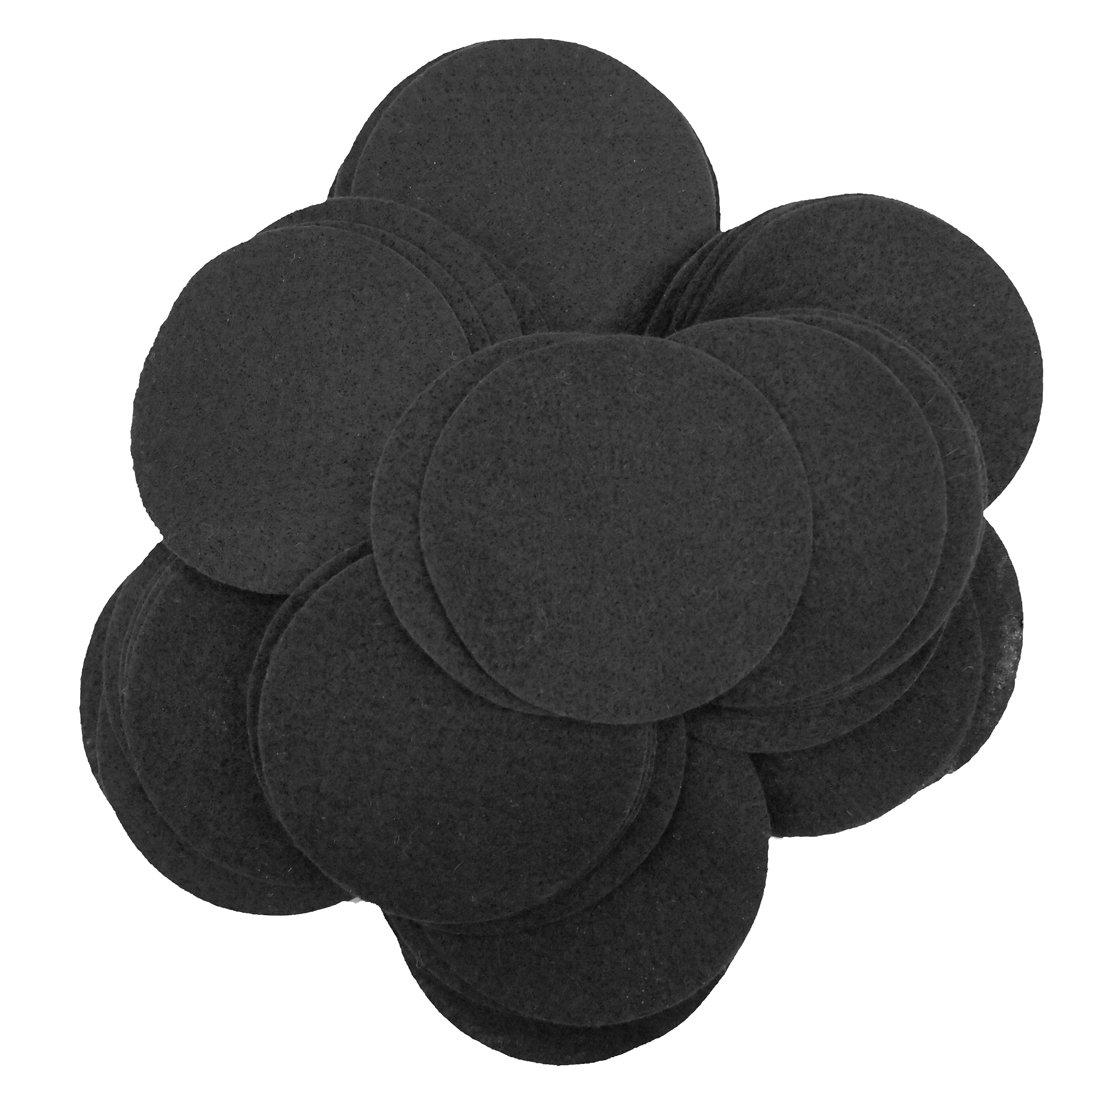 Playfully Ever After 3 Inch Black 30pc Felt Circles PEA-FELT-3INDOT-50Black